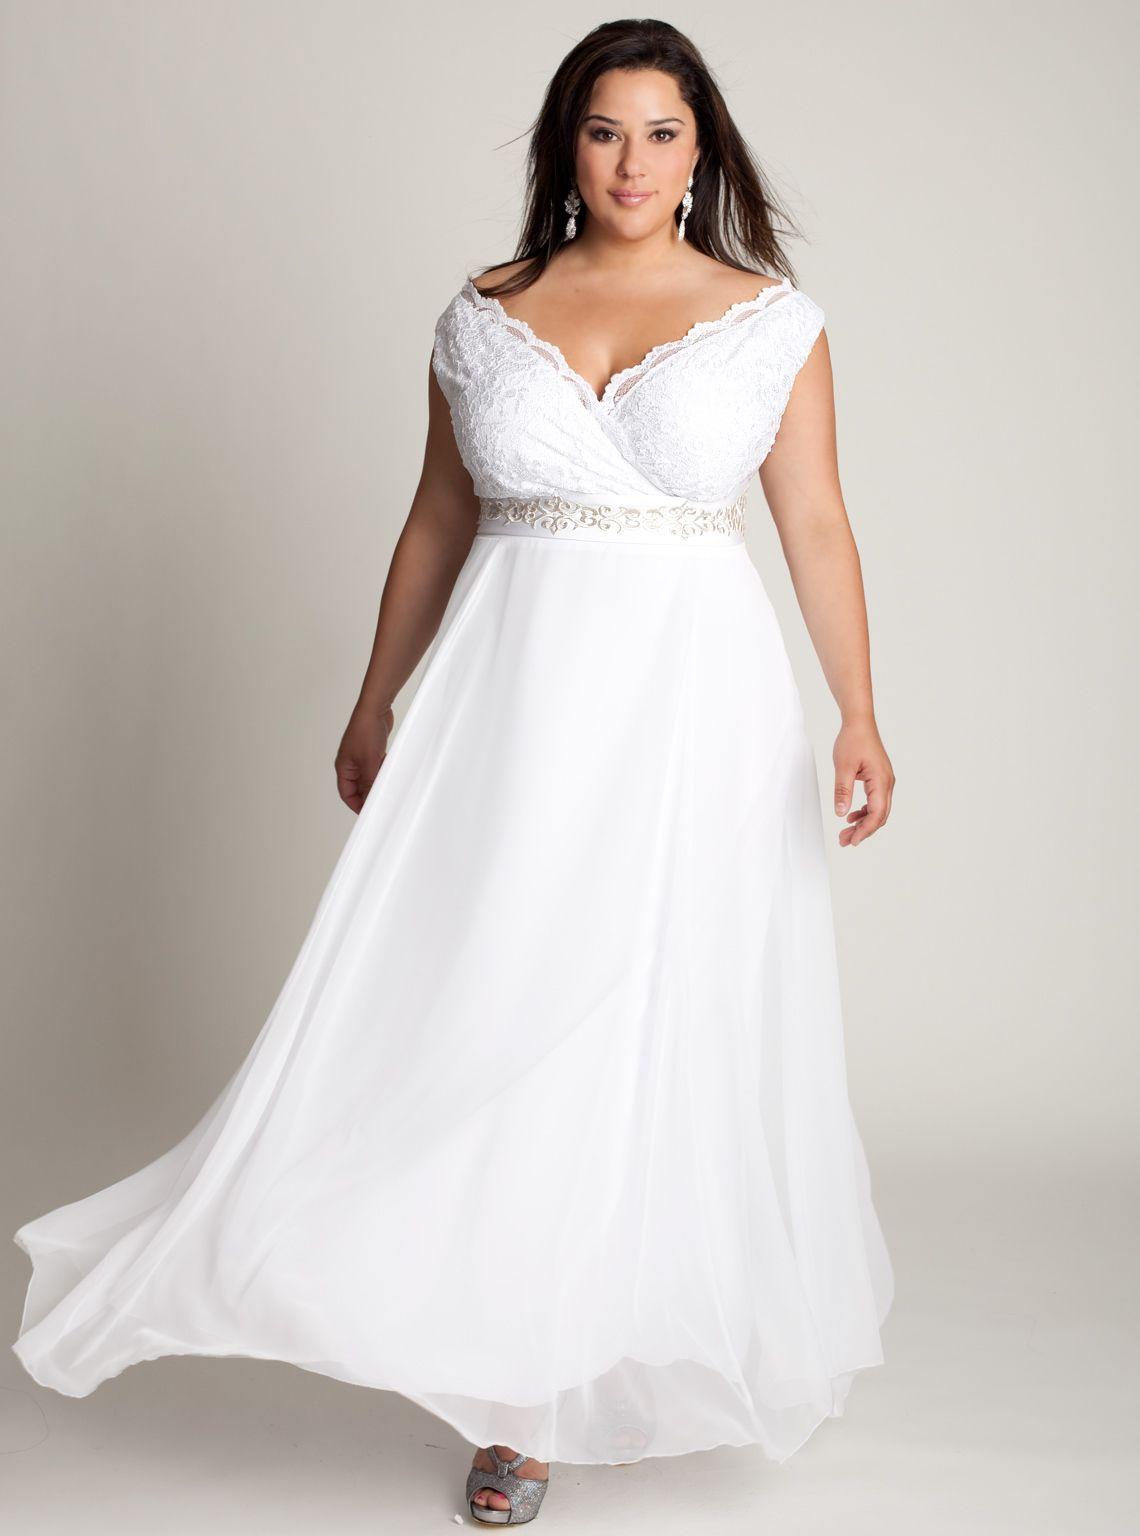 Plus Size Casual Beach Wedding Dresses Best Wedding Dress For Pear